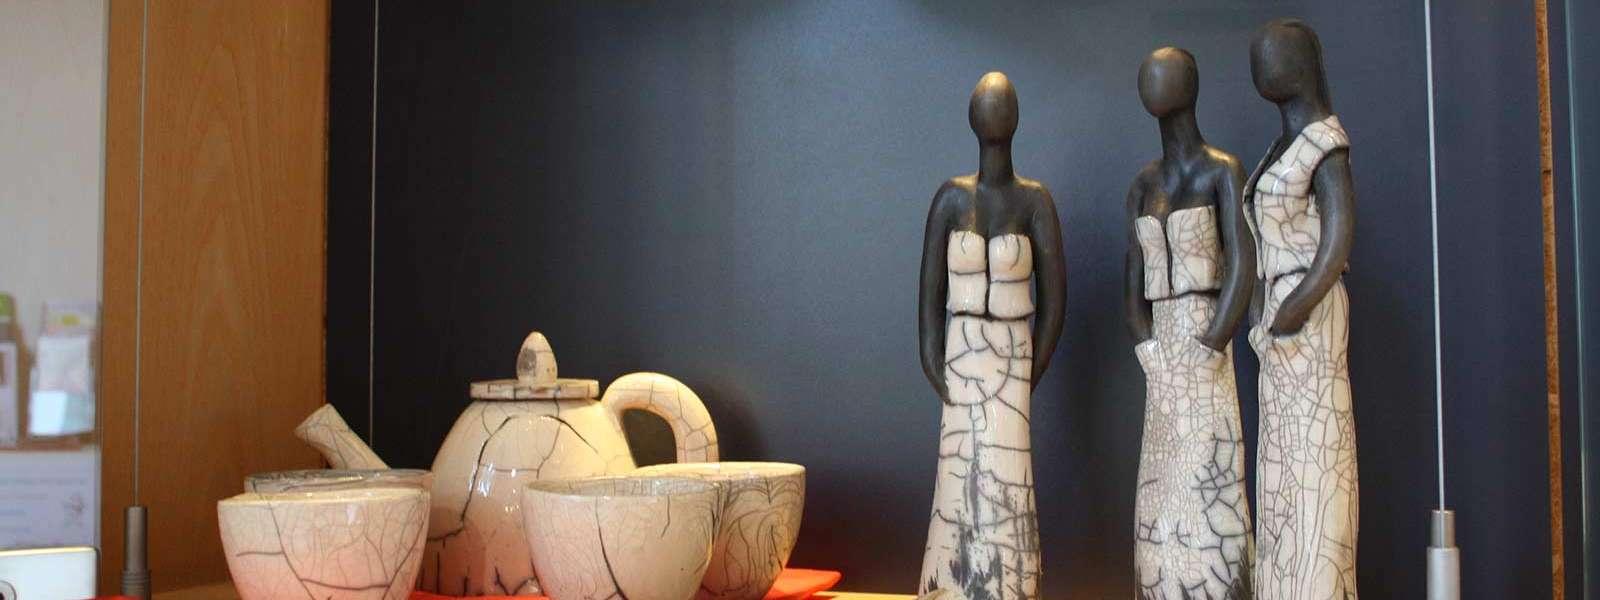 Exposition Art et Artisanat, Niederbronn-les-Bains